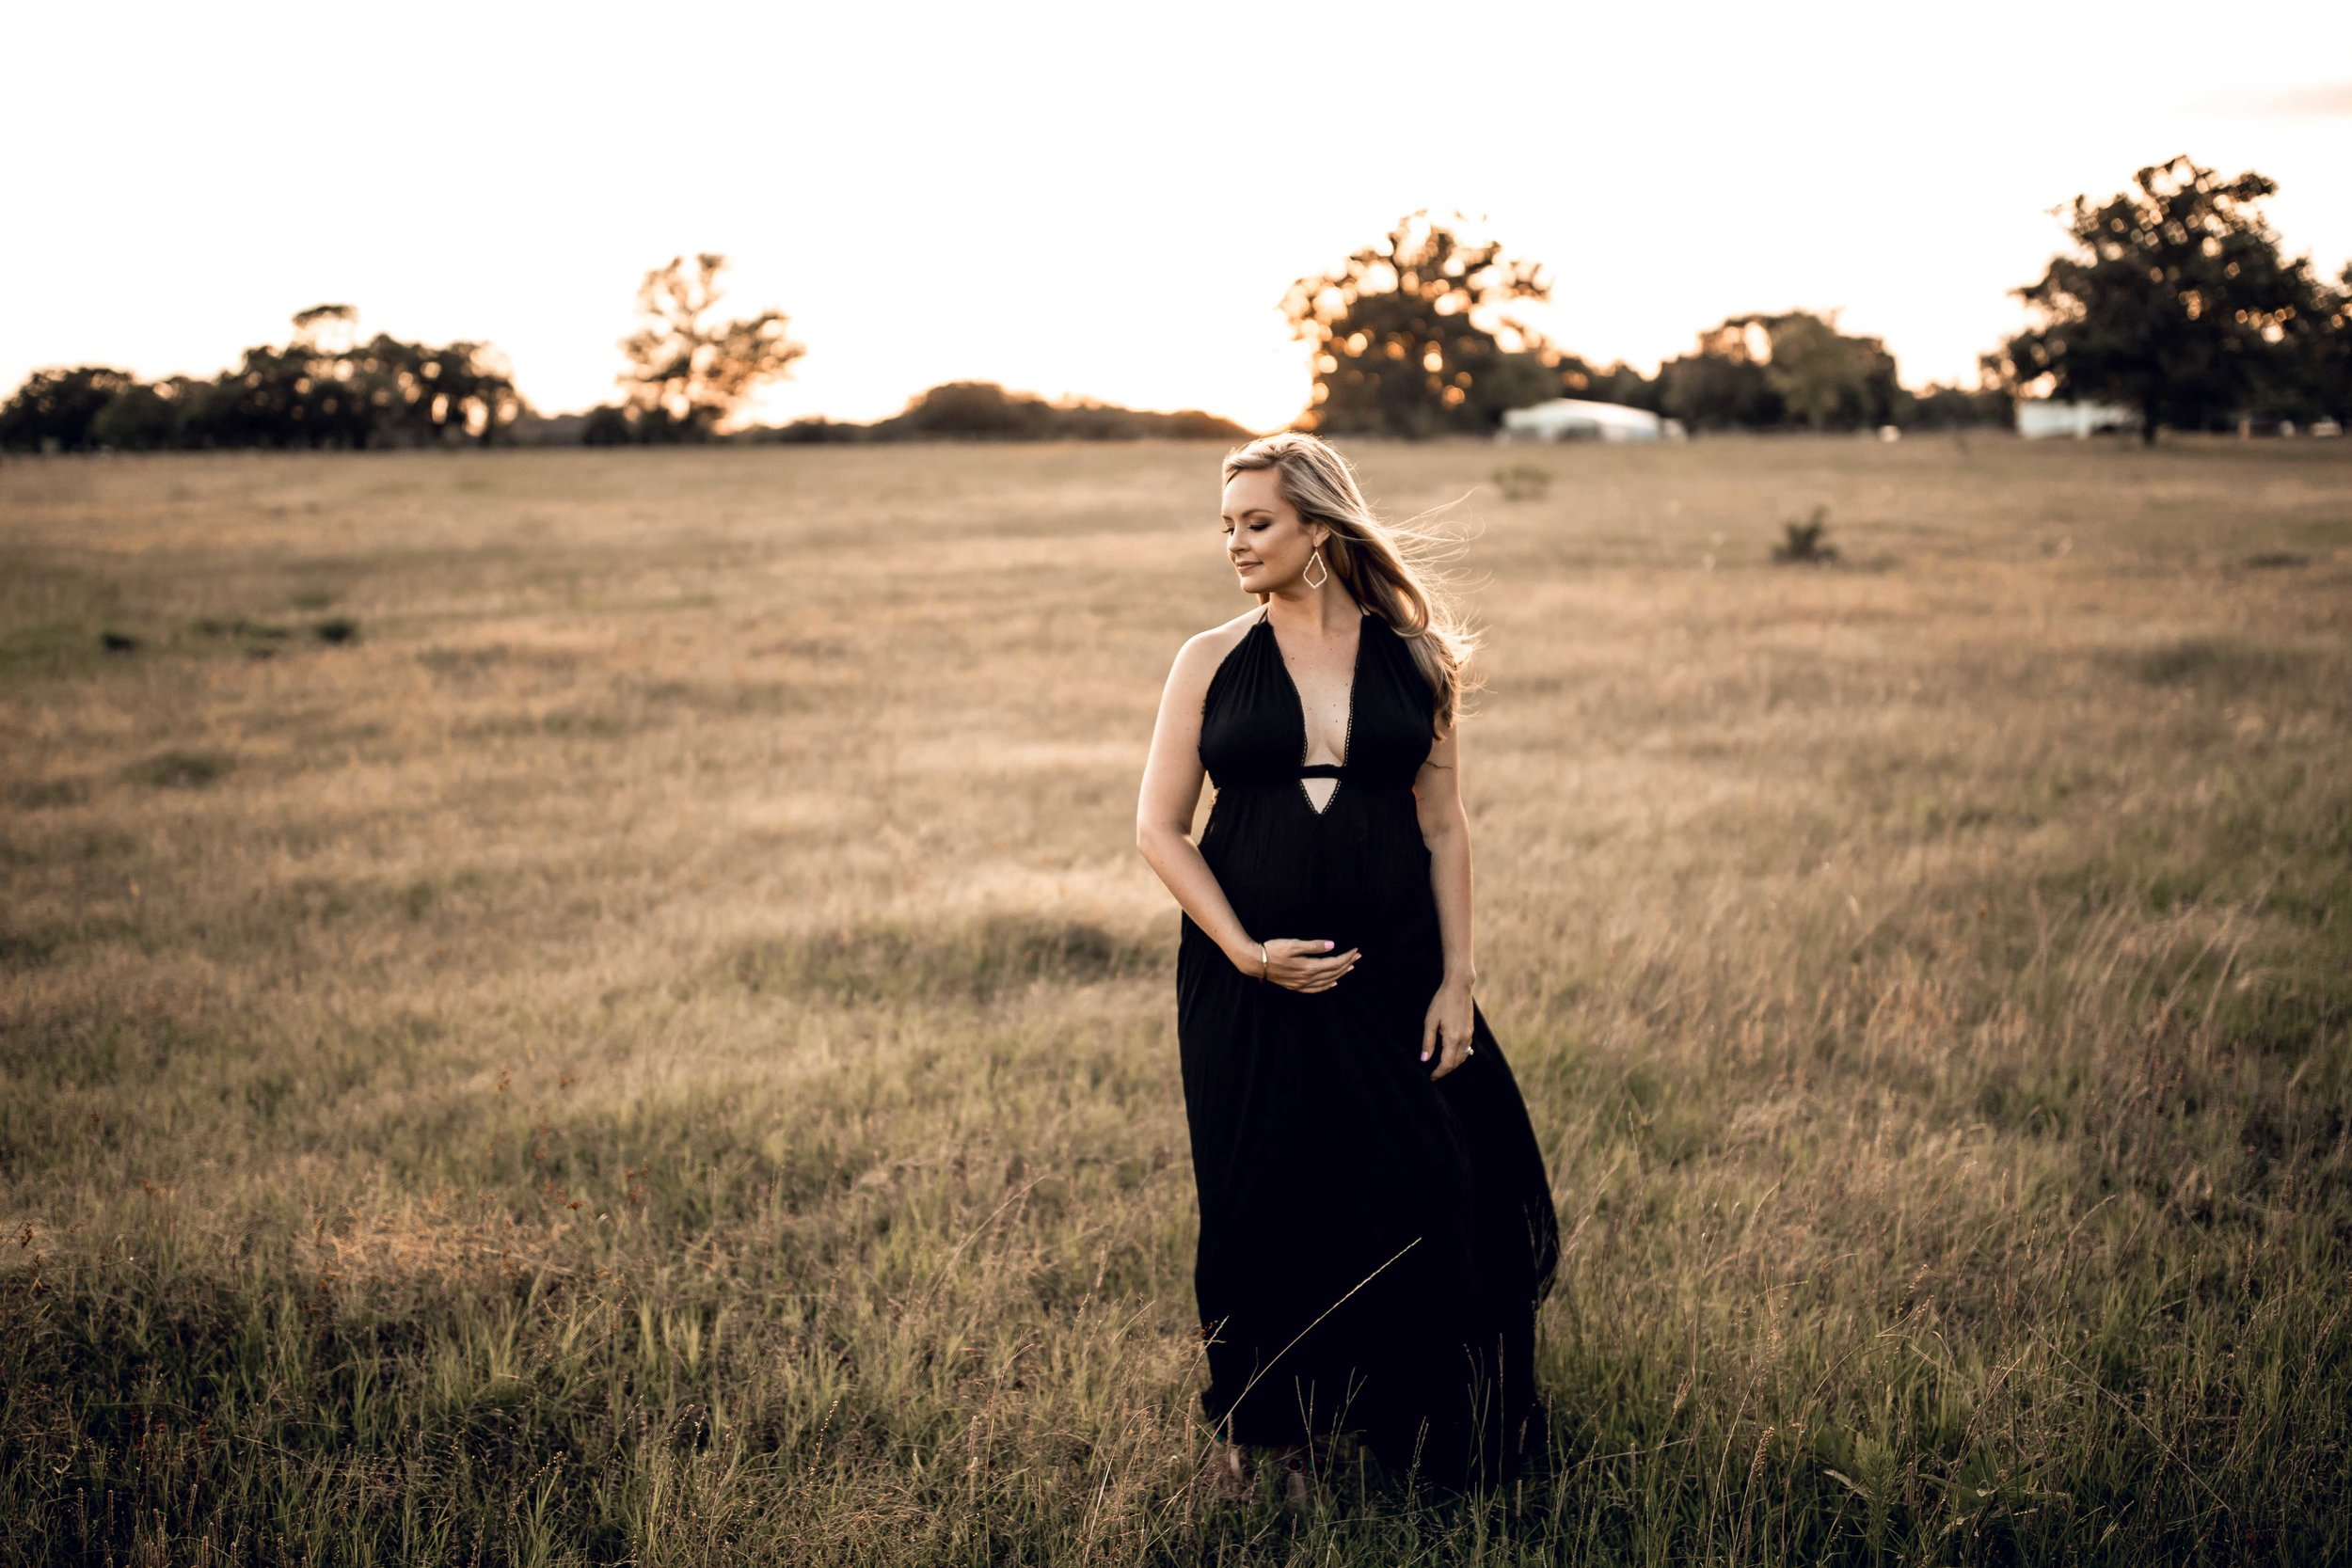 shelby-schiller-photography-maternity-deep-v-black-dress-in-field-at-sunset.jpg